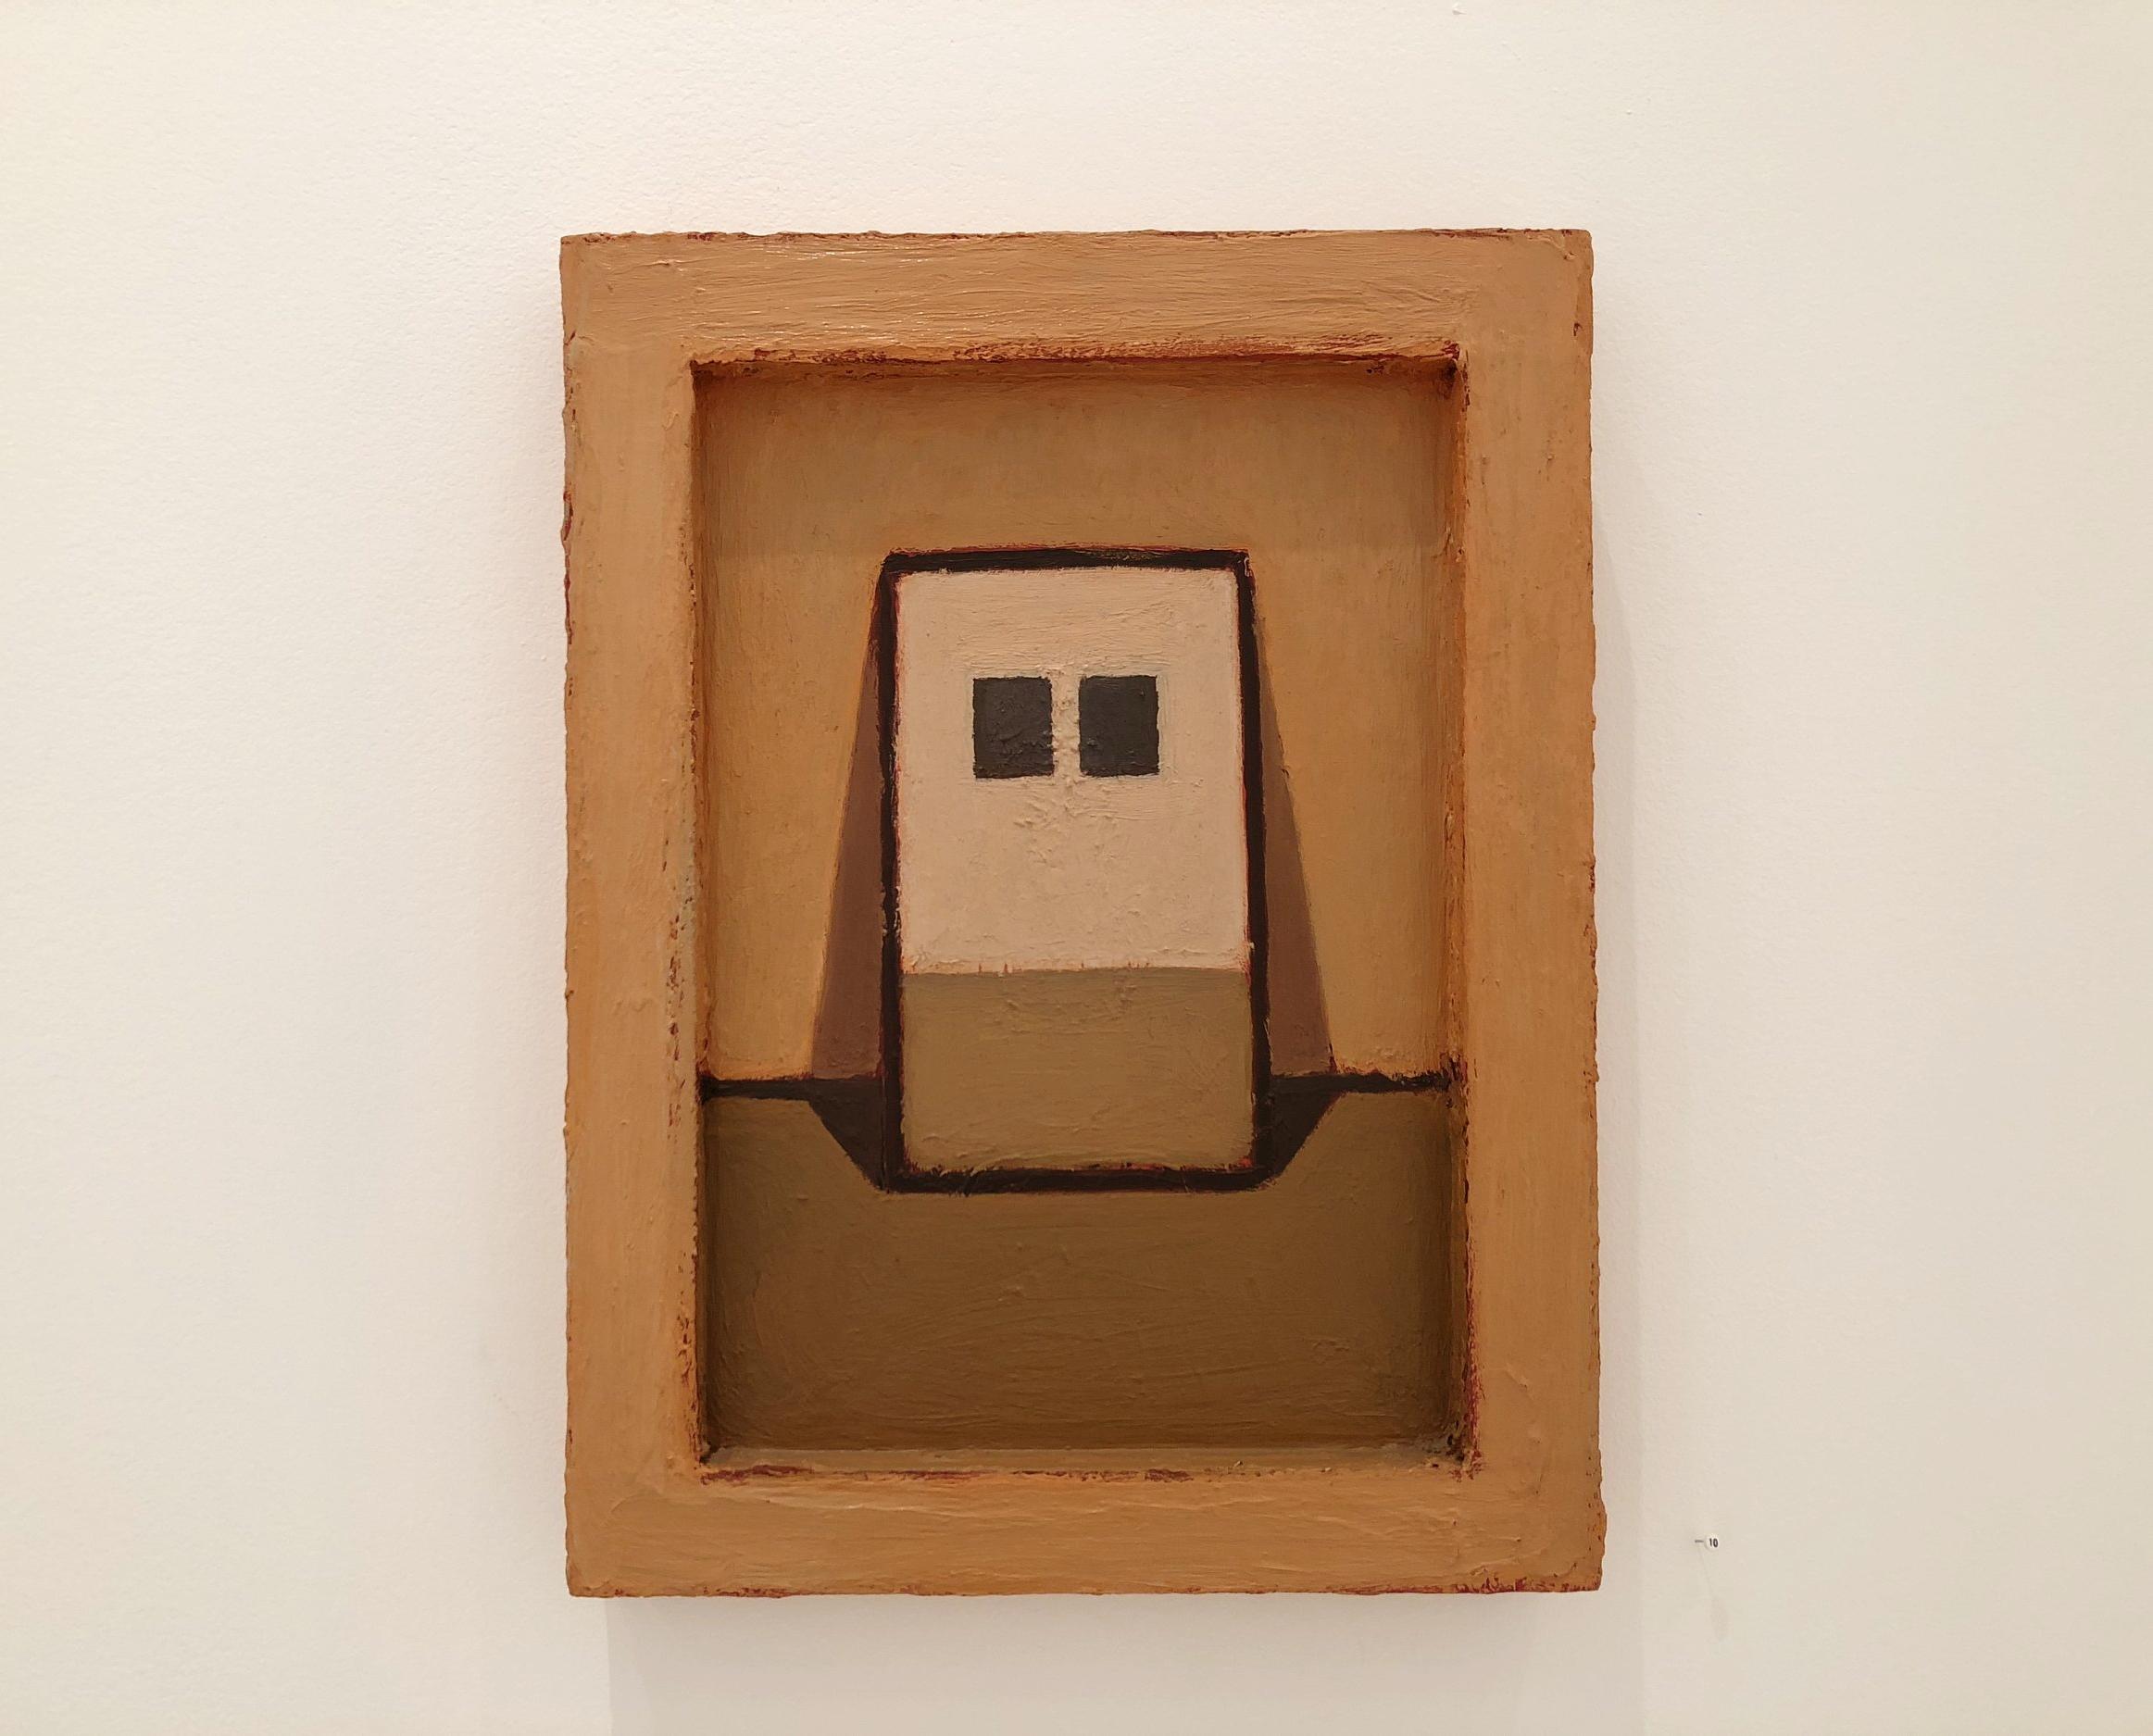 "Lori Taschler, Untitled (orange), 2002, 16"" x 12"", oil on wood in painted wood frame"